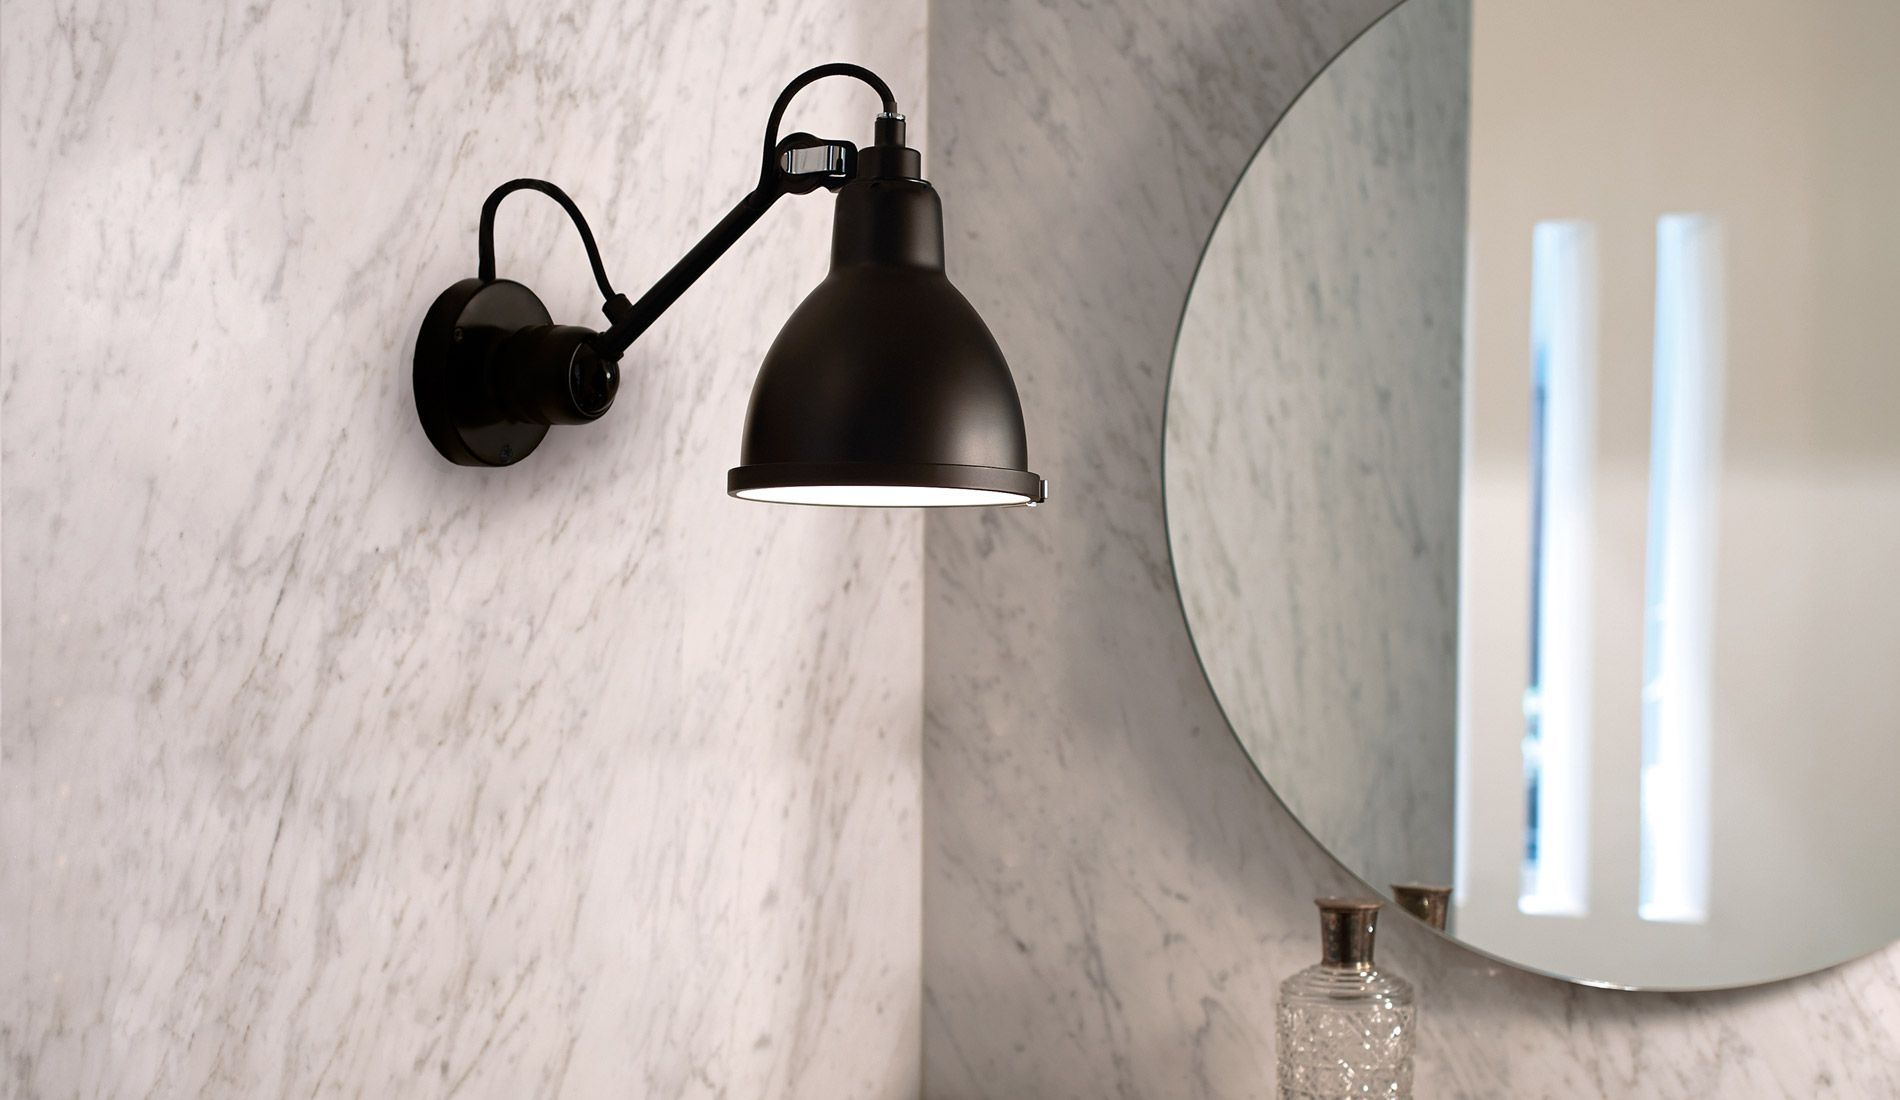 Deckenlampe badezimmer ~ Dcw lampe gras n° badezimmer wandleuchte samani taa